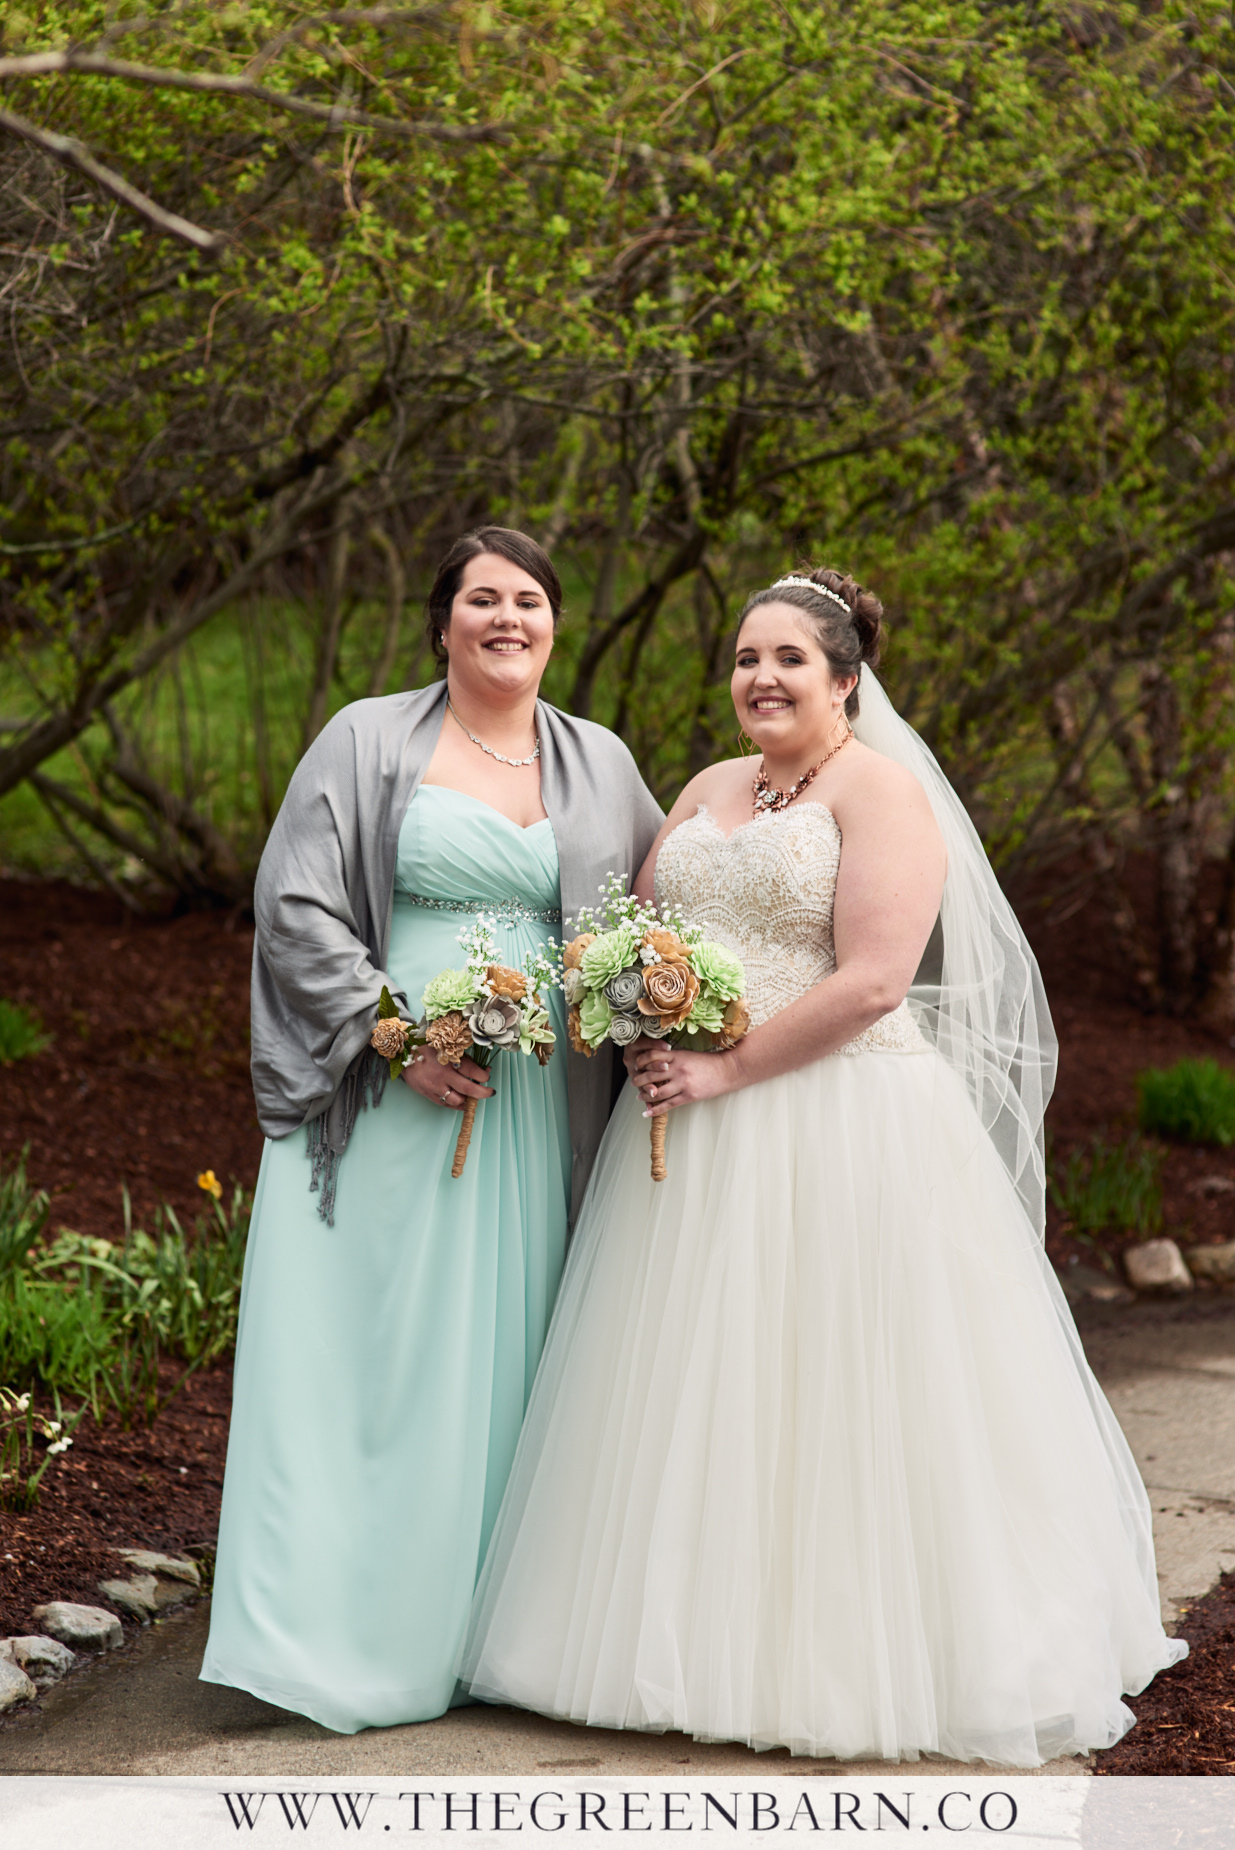 Bride with Bridesmaid in Sea Foam Green Bridesmaid Dress for a Spring Wedding